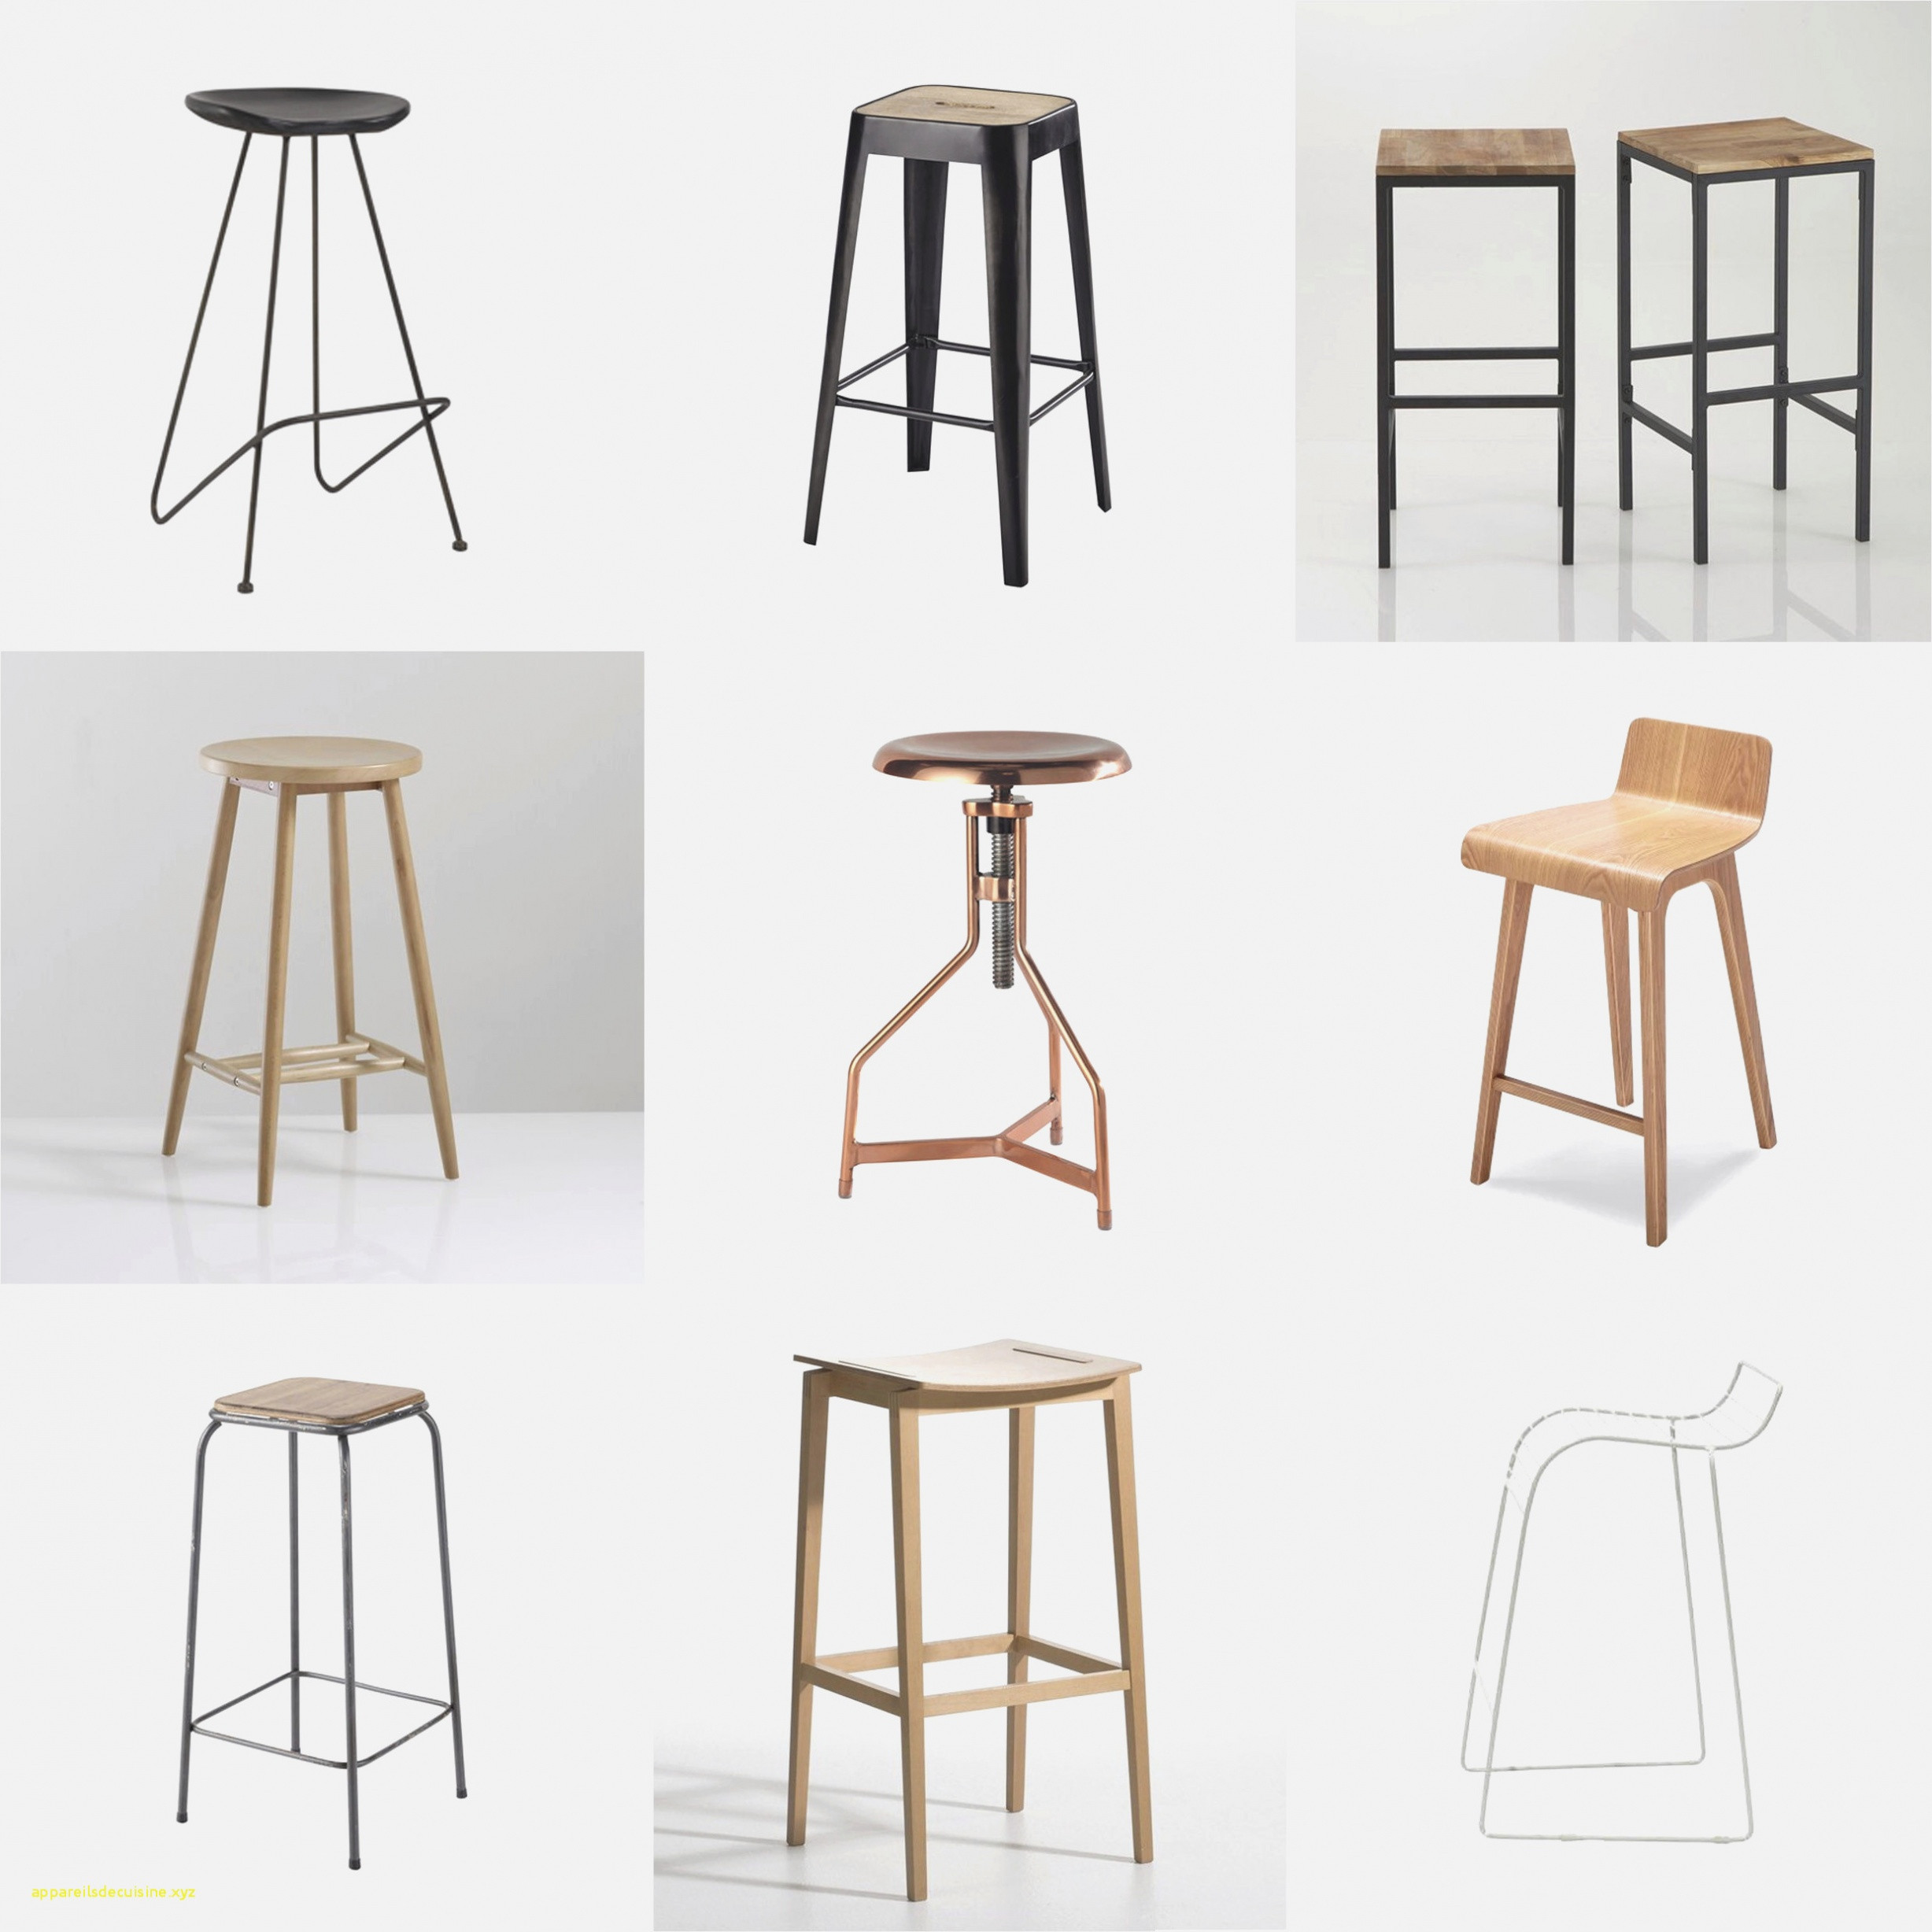 assise chaise haute sove chaise haute cuisine sovedis aquatabs of assise chaise haute